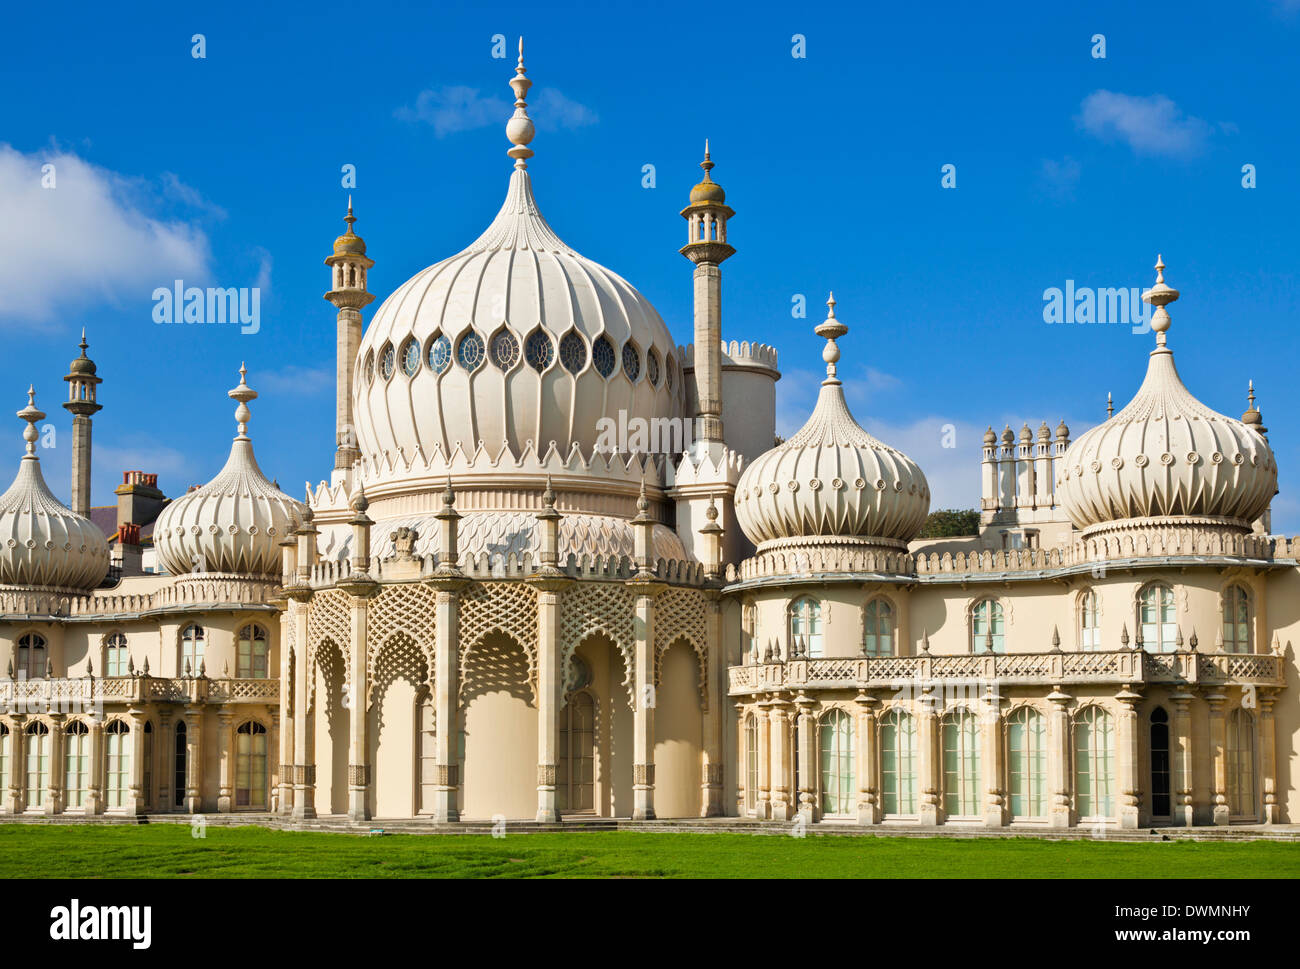 Brighton Royal Pavilion, Brighton, East Sussex, Inglaterra, Reino Unido, Europa Imagen De Stock